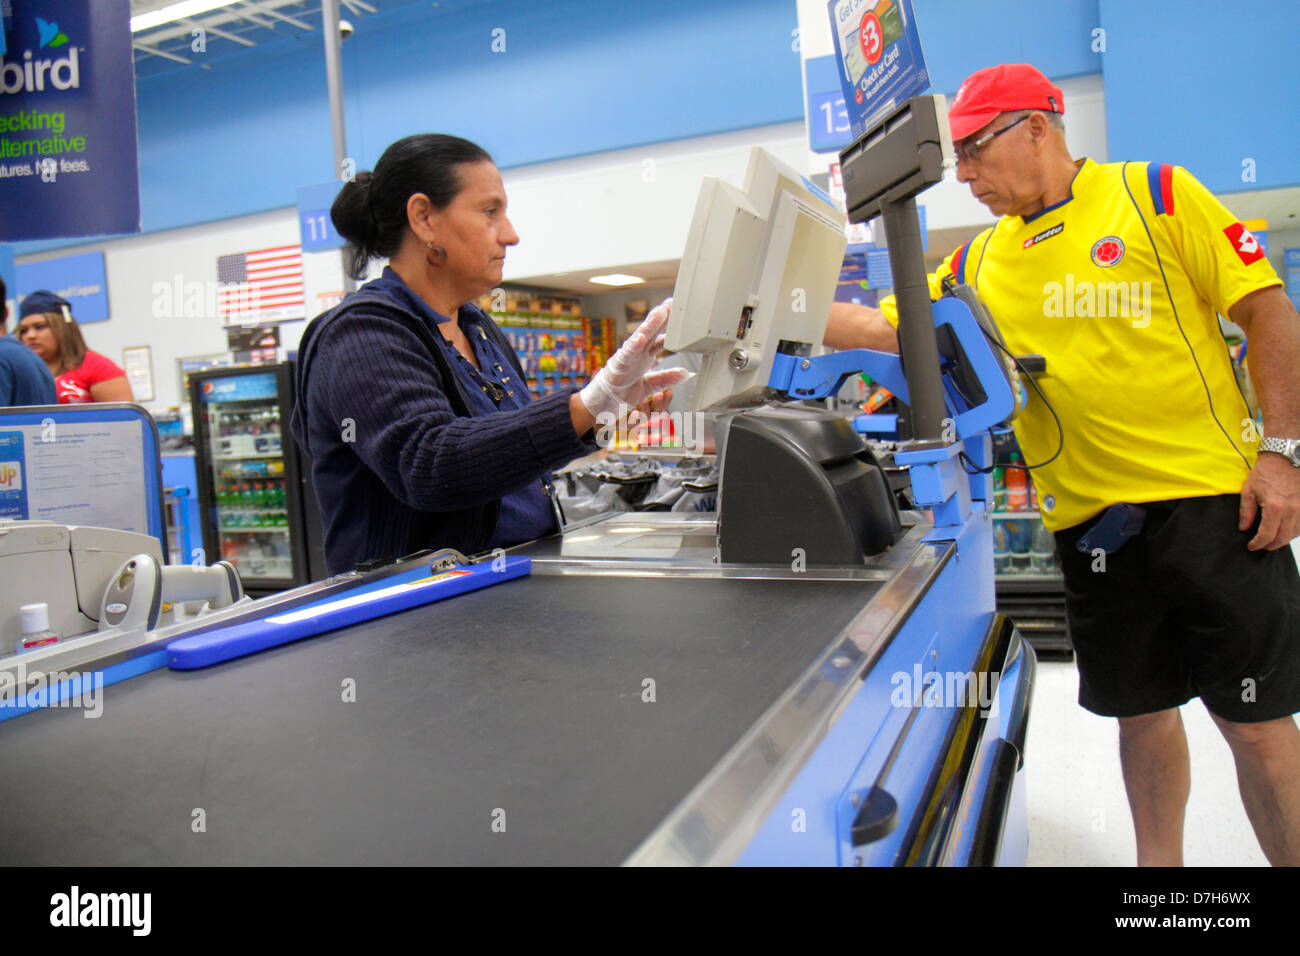 Miami Florida Wal-Mart Walmart discount shopping Abfahrt Linie Warteschlange Kasse Hispanic Frau Job Mitarbeiter Stockfoto